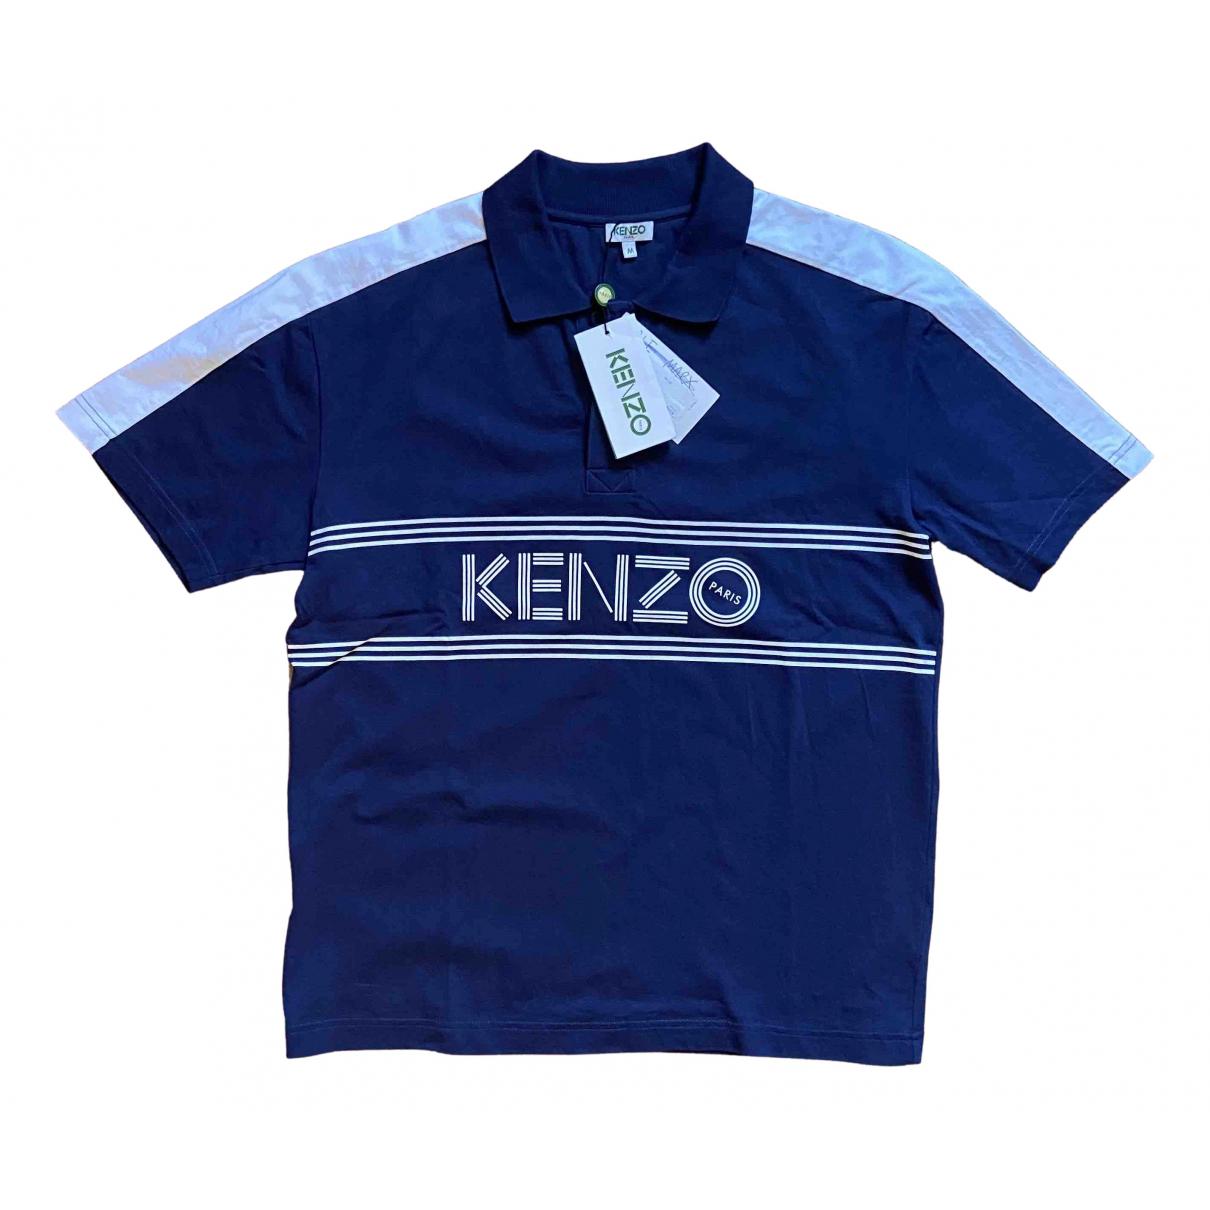 Kenzo - Tee shirts   pour homme en coton - bleu